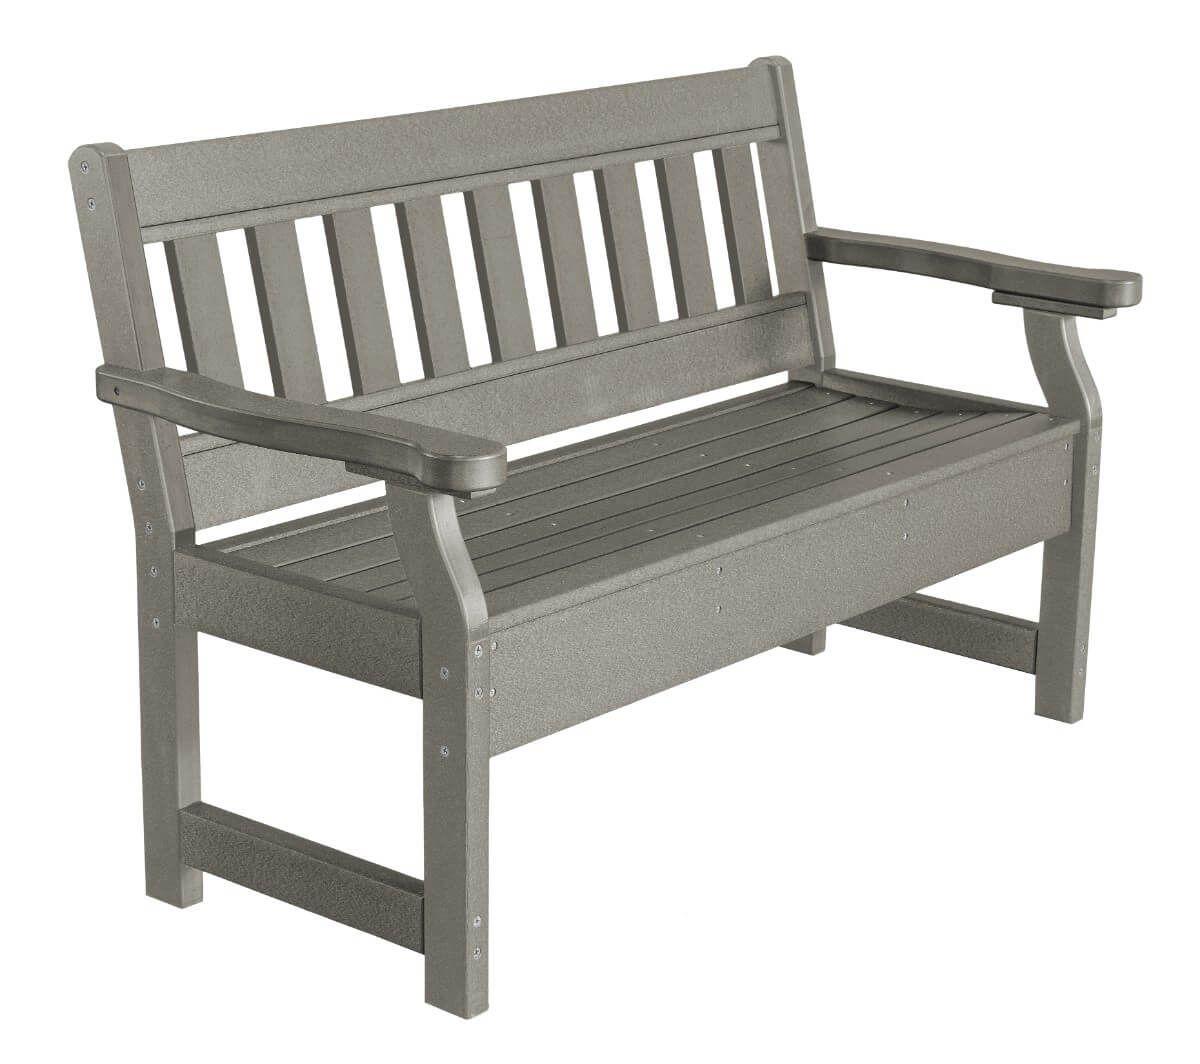 Light Gray Aden Garden Bench